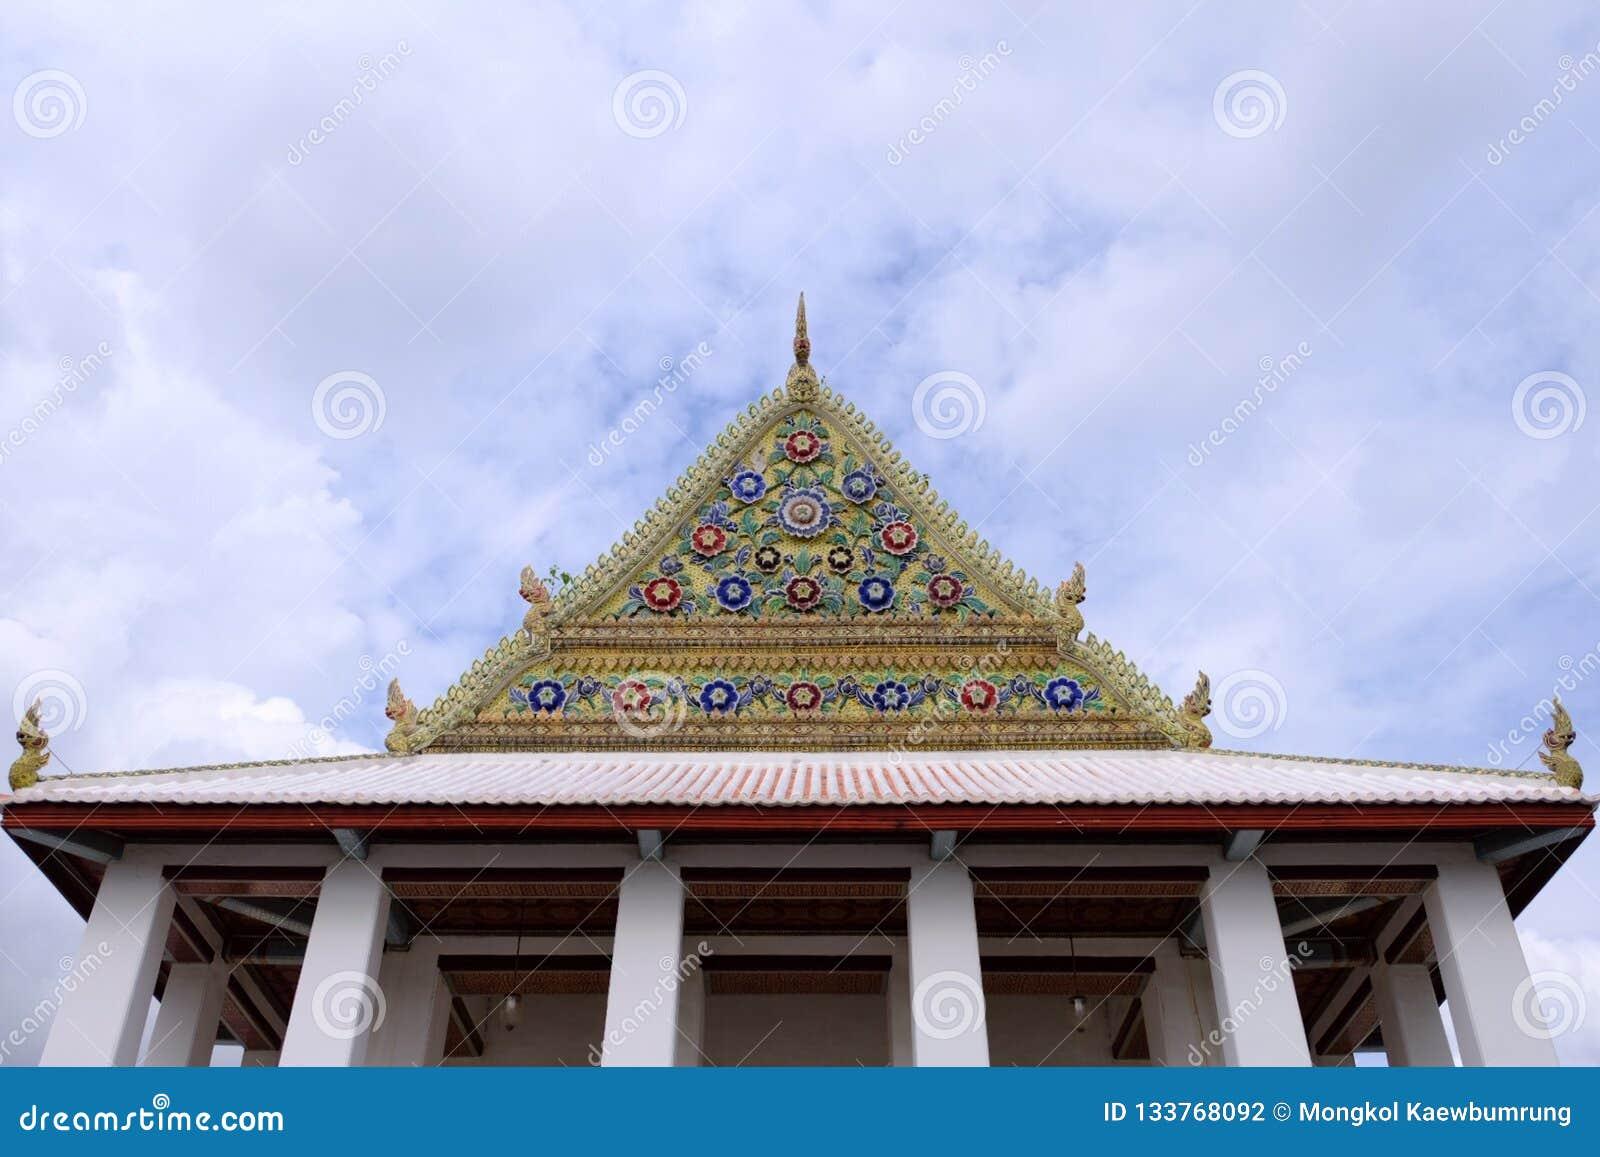 Frontão real tailandês do santuário de Wat Chaloem Phra Kiat Worawihan